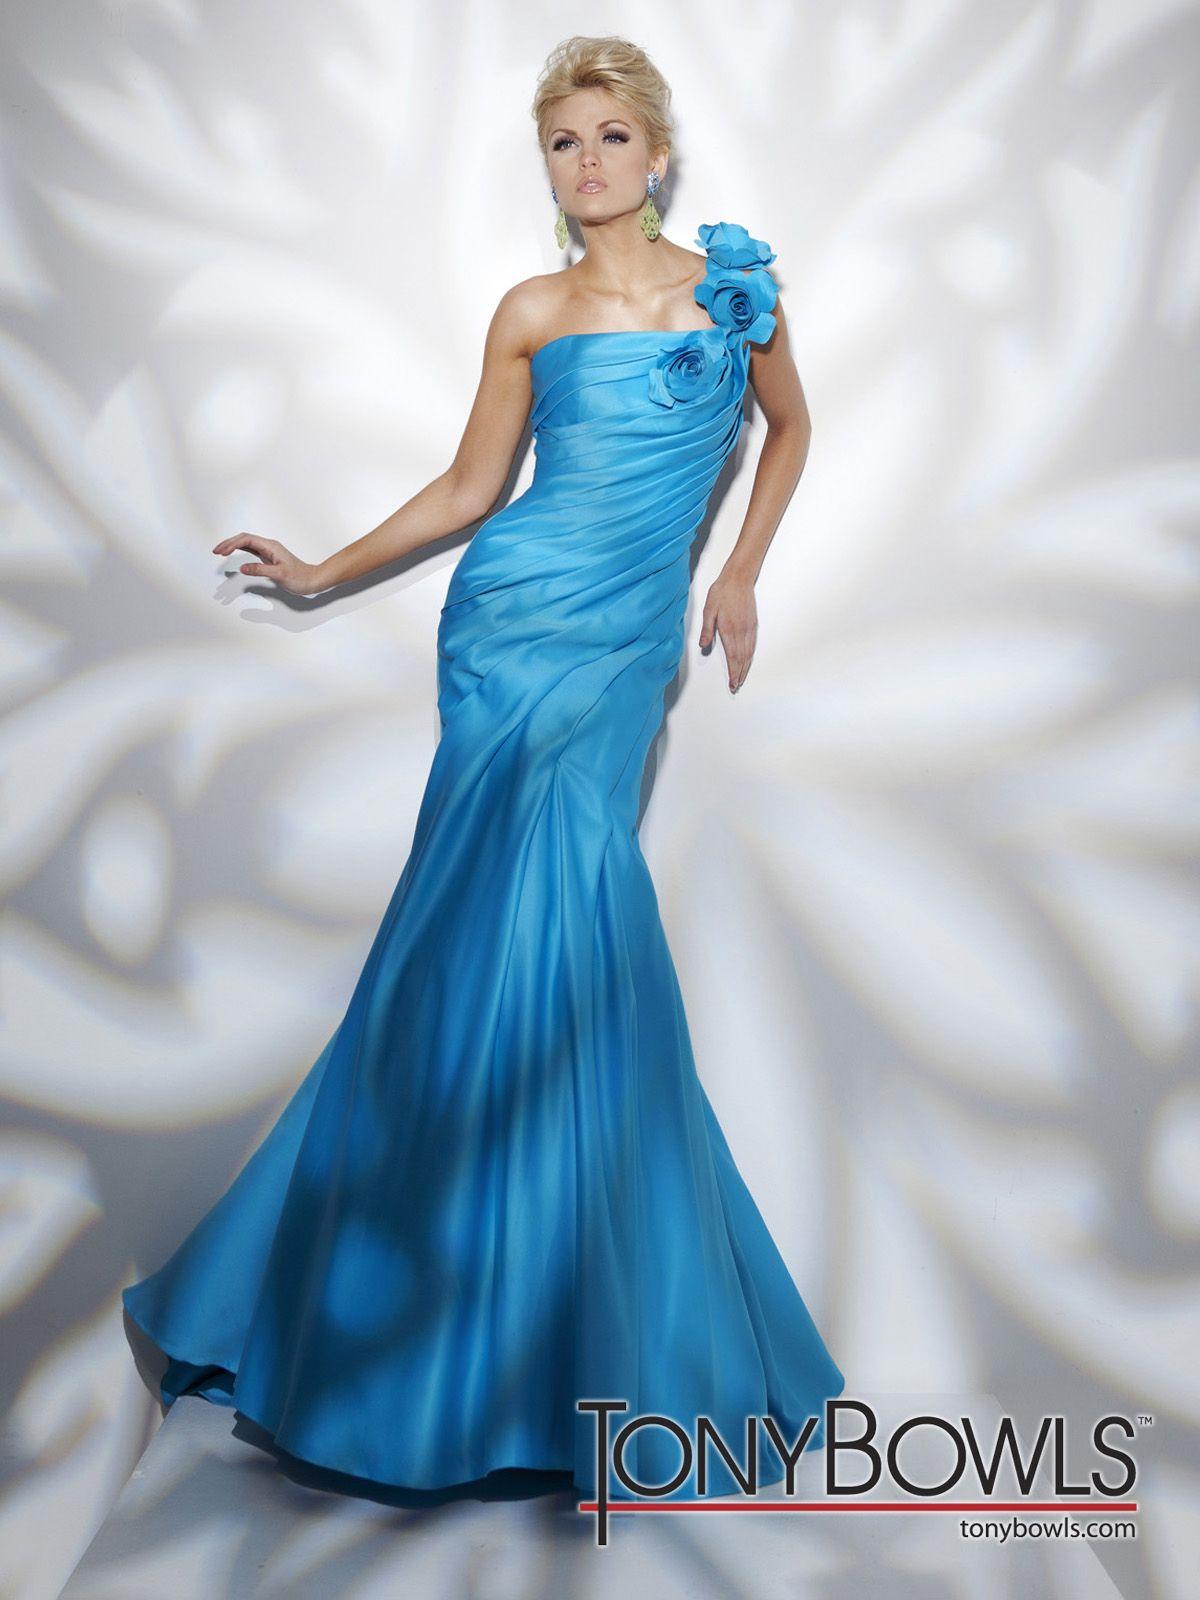 Tony Bowls, Bridesmaid Dress - Style #211C57: One-shoulder satin ...